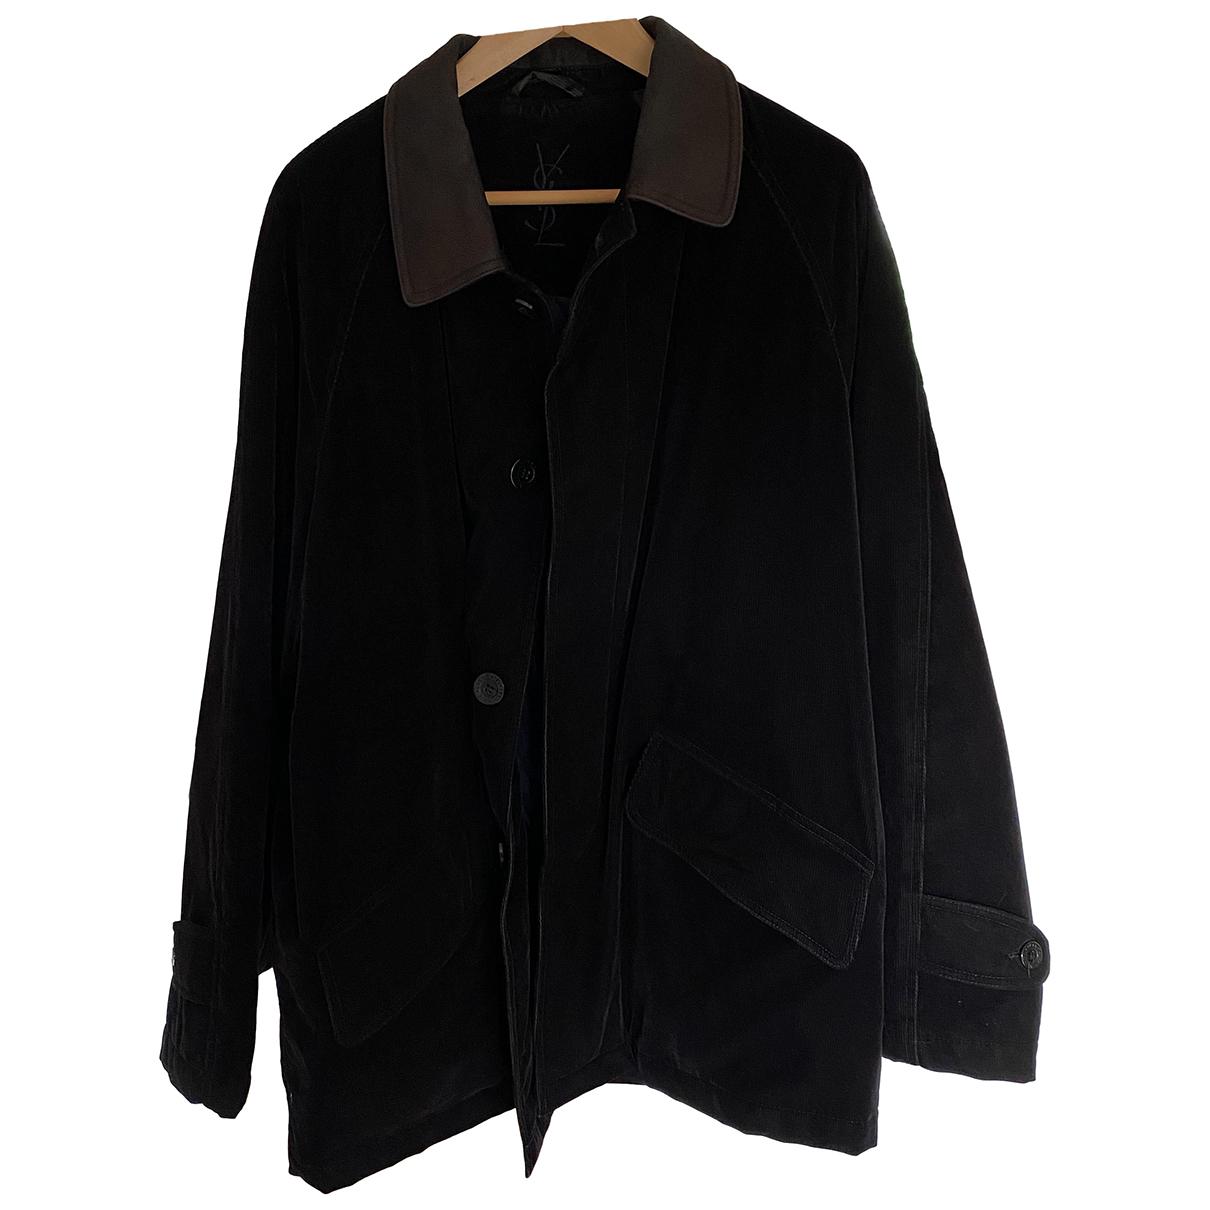 Yves Saint Laurent N Black Cotton Jacket for Men